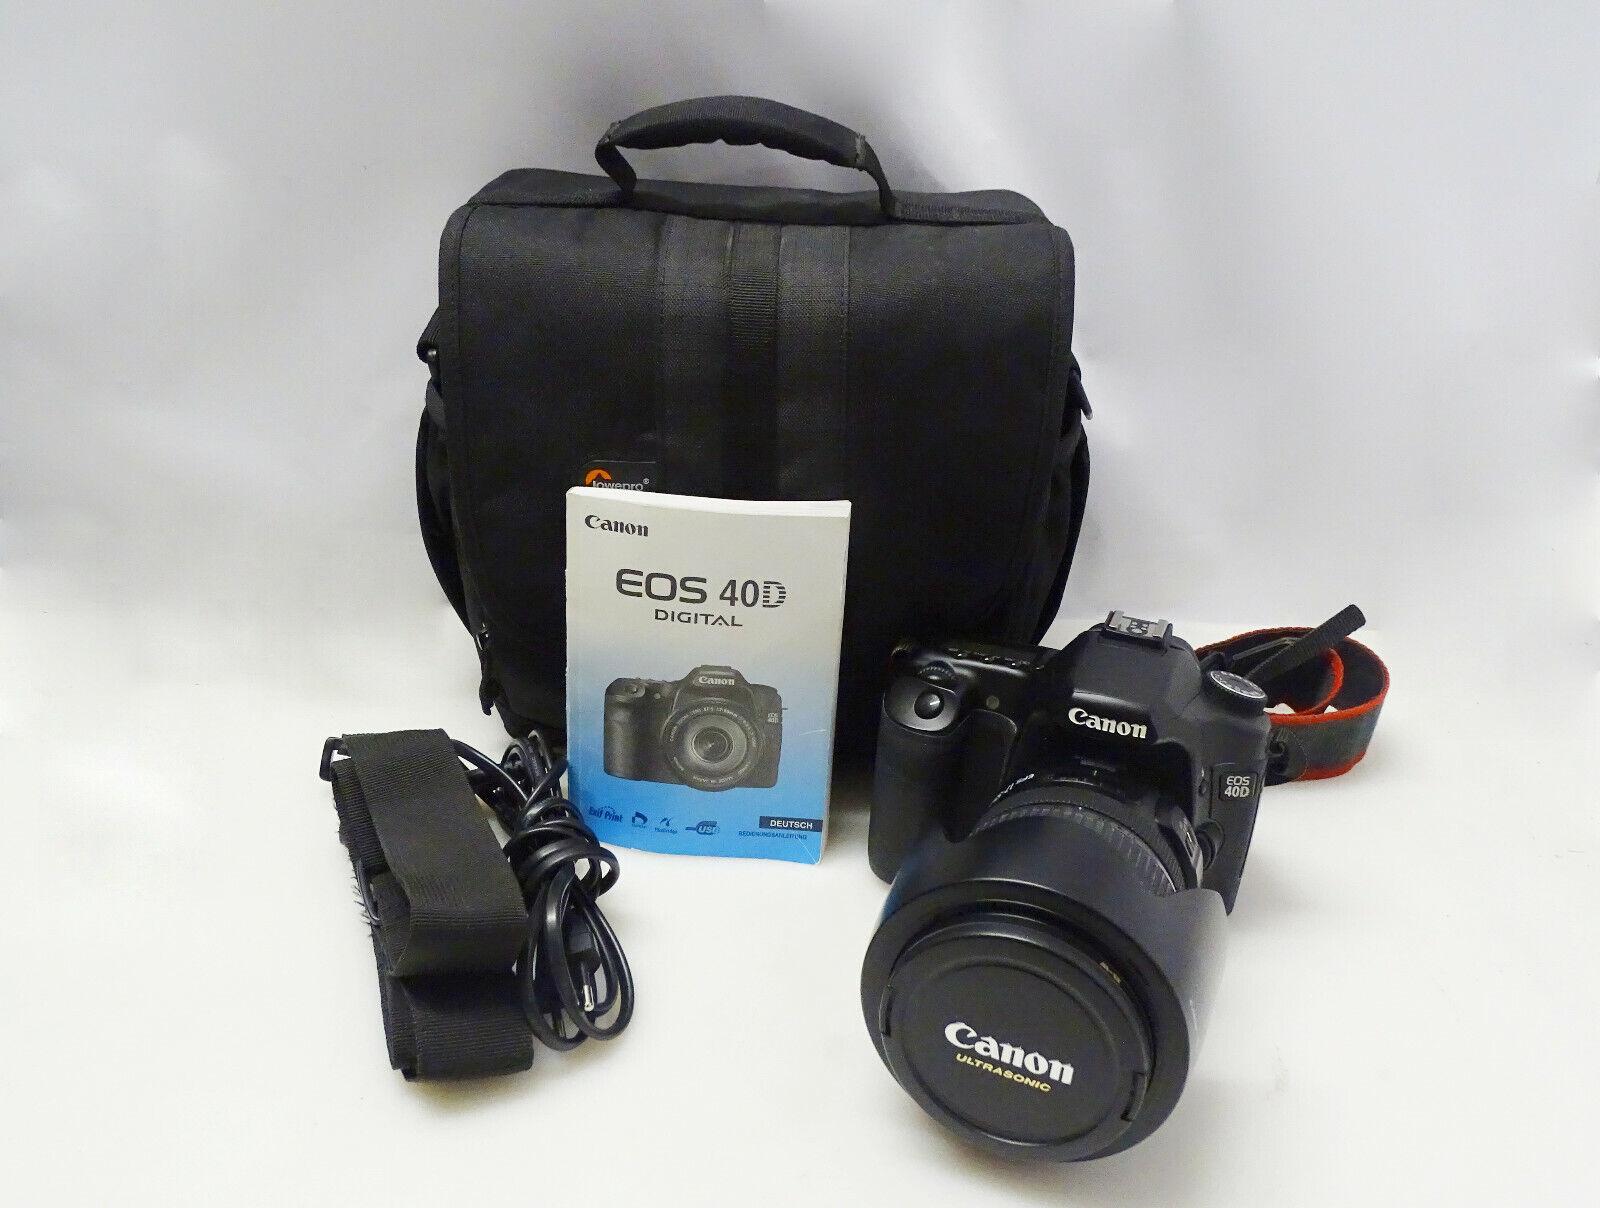 CANON EOS 40D SPIEGELREFLEXKAMERA + EFS 17-55mm Canon Zoom Lens